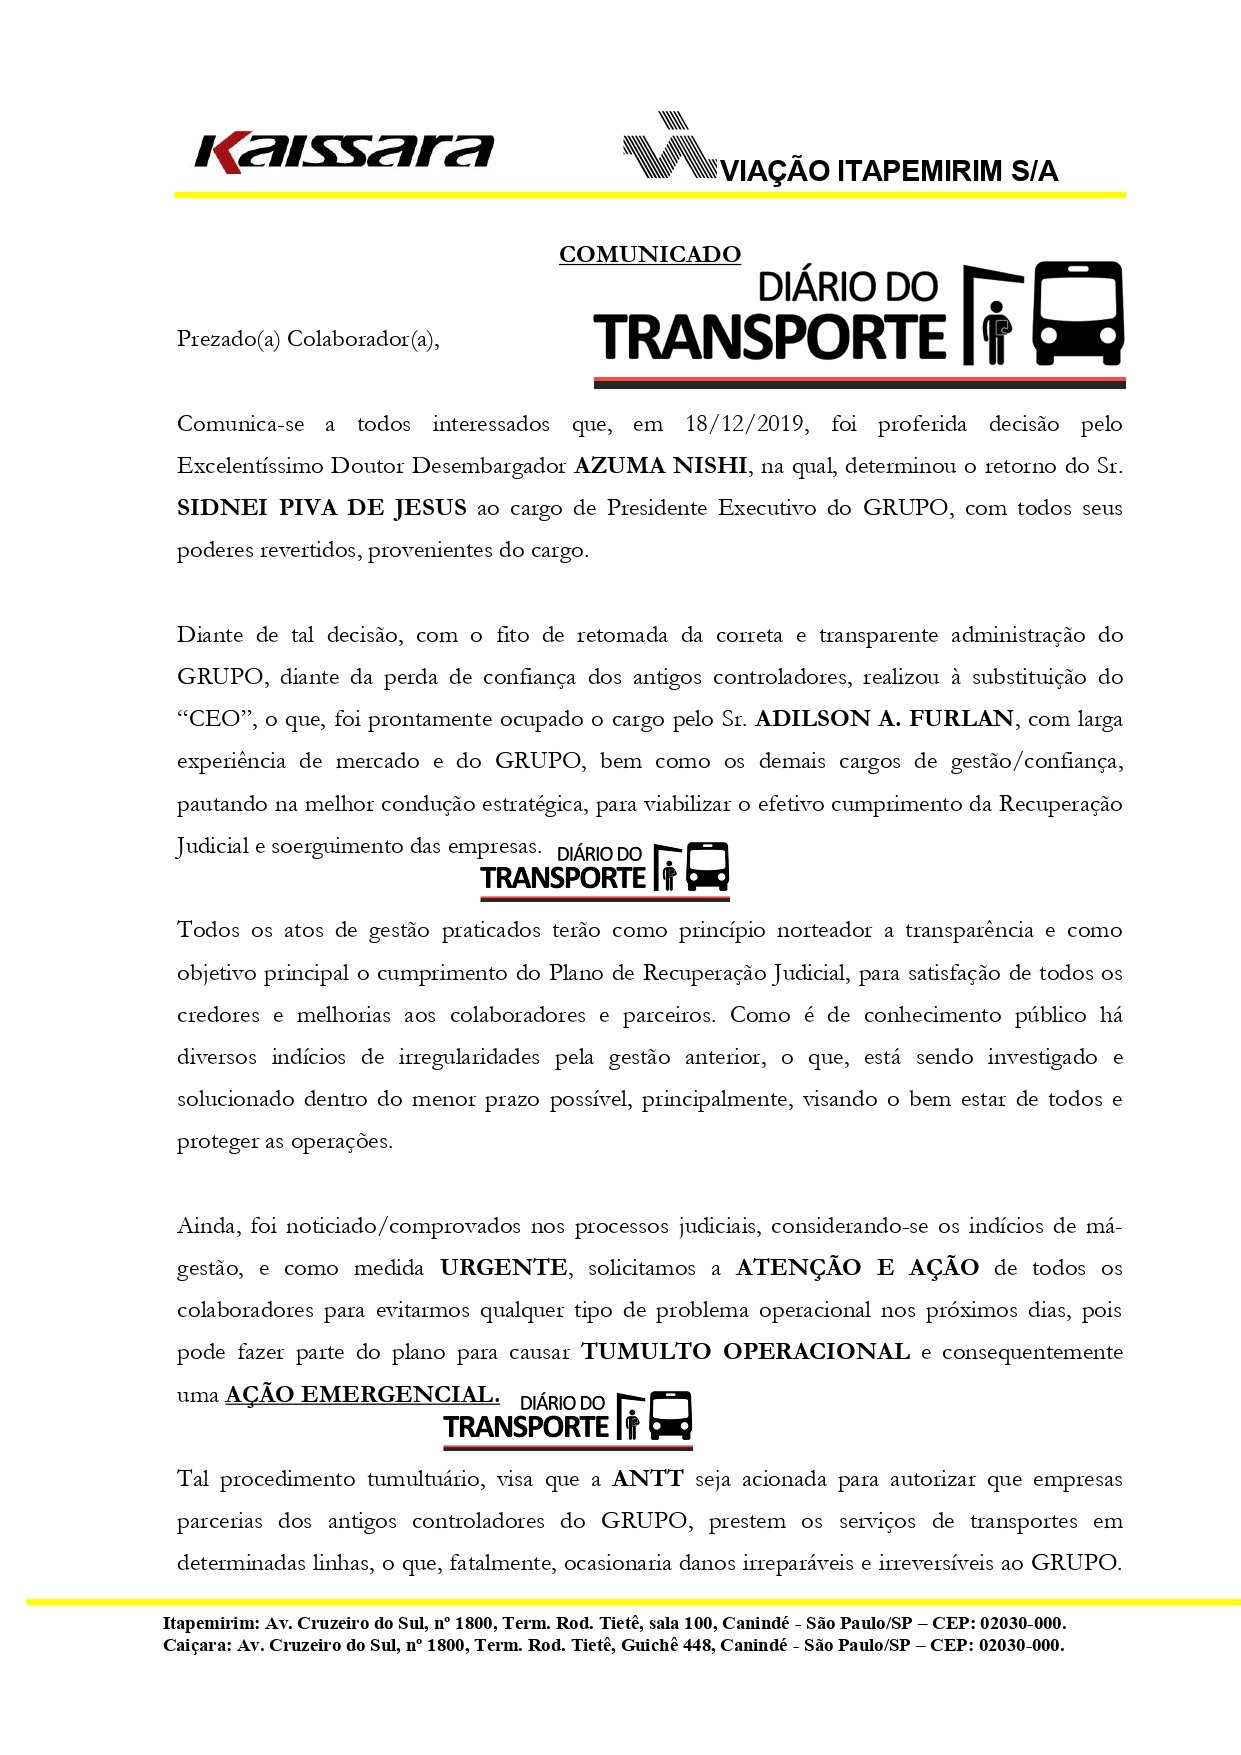 COMUNICADO EMERGENCIAL - COLABORADORES_page-0001.jpg